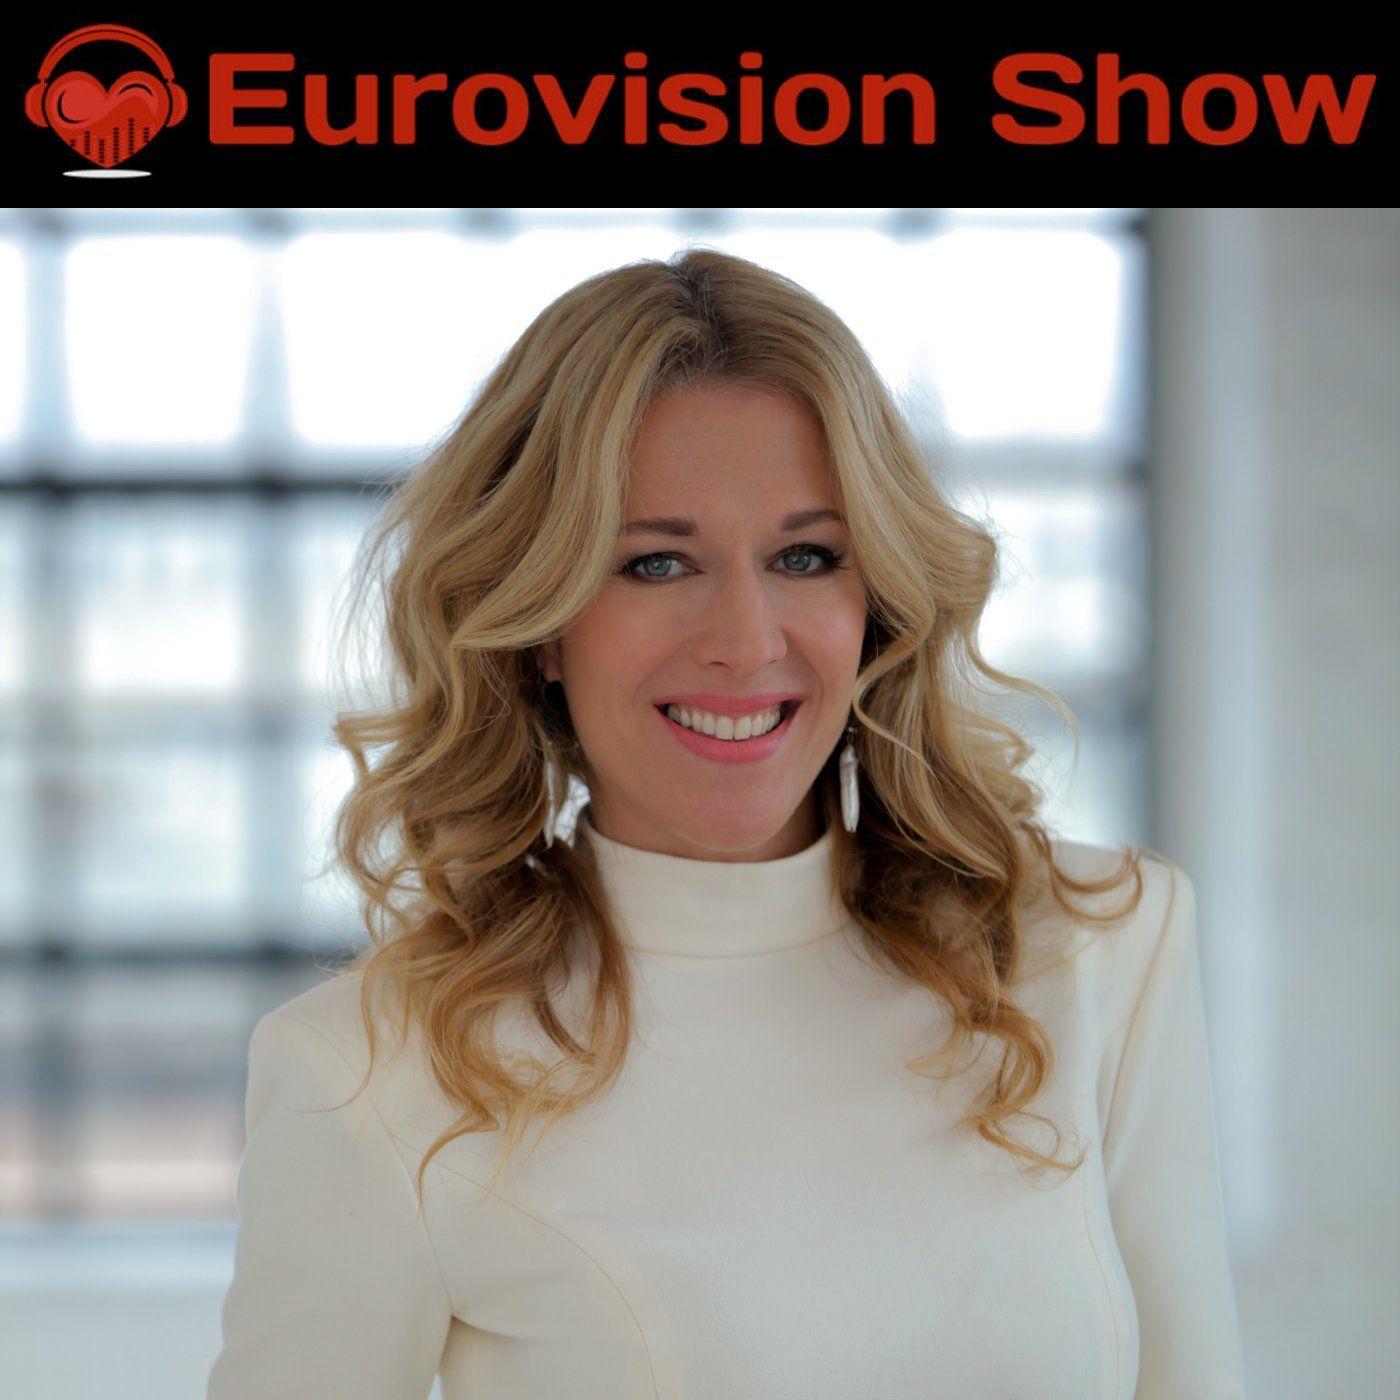 Eurovision Show #079